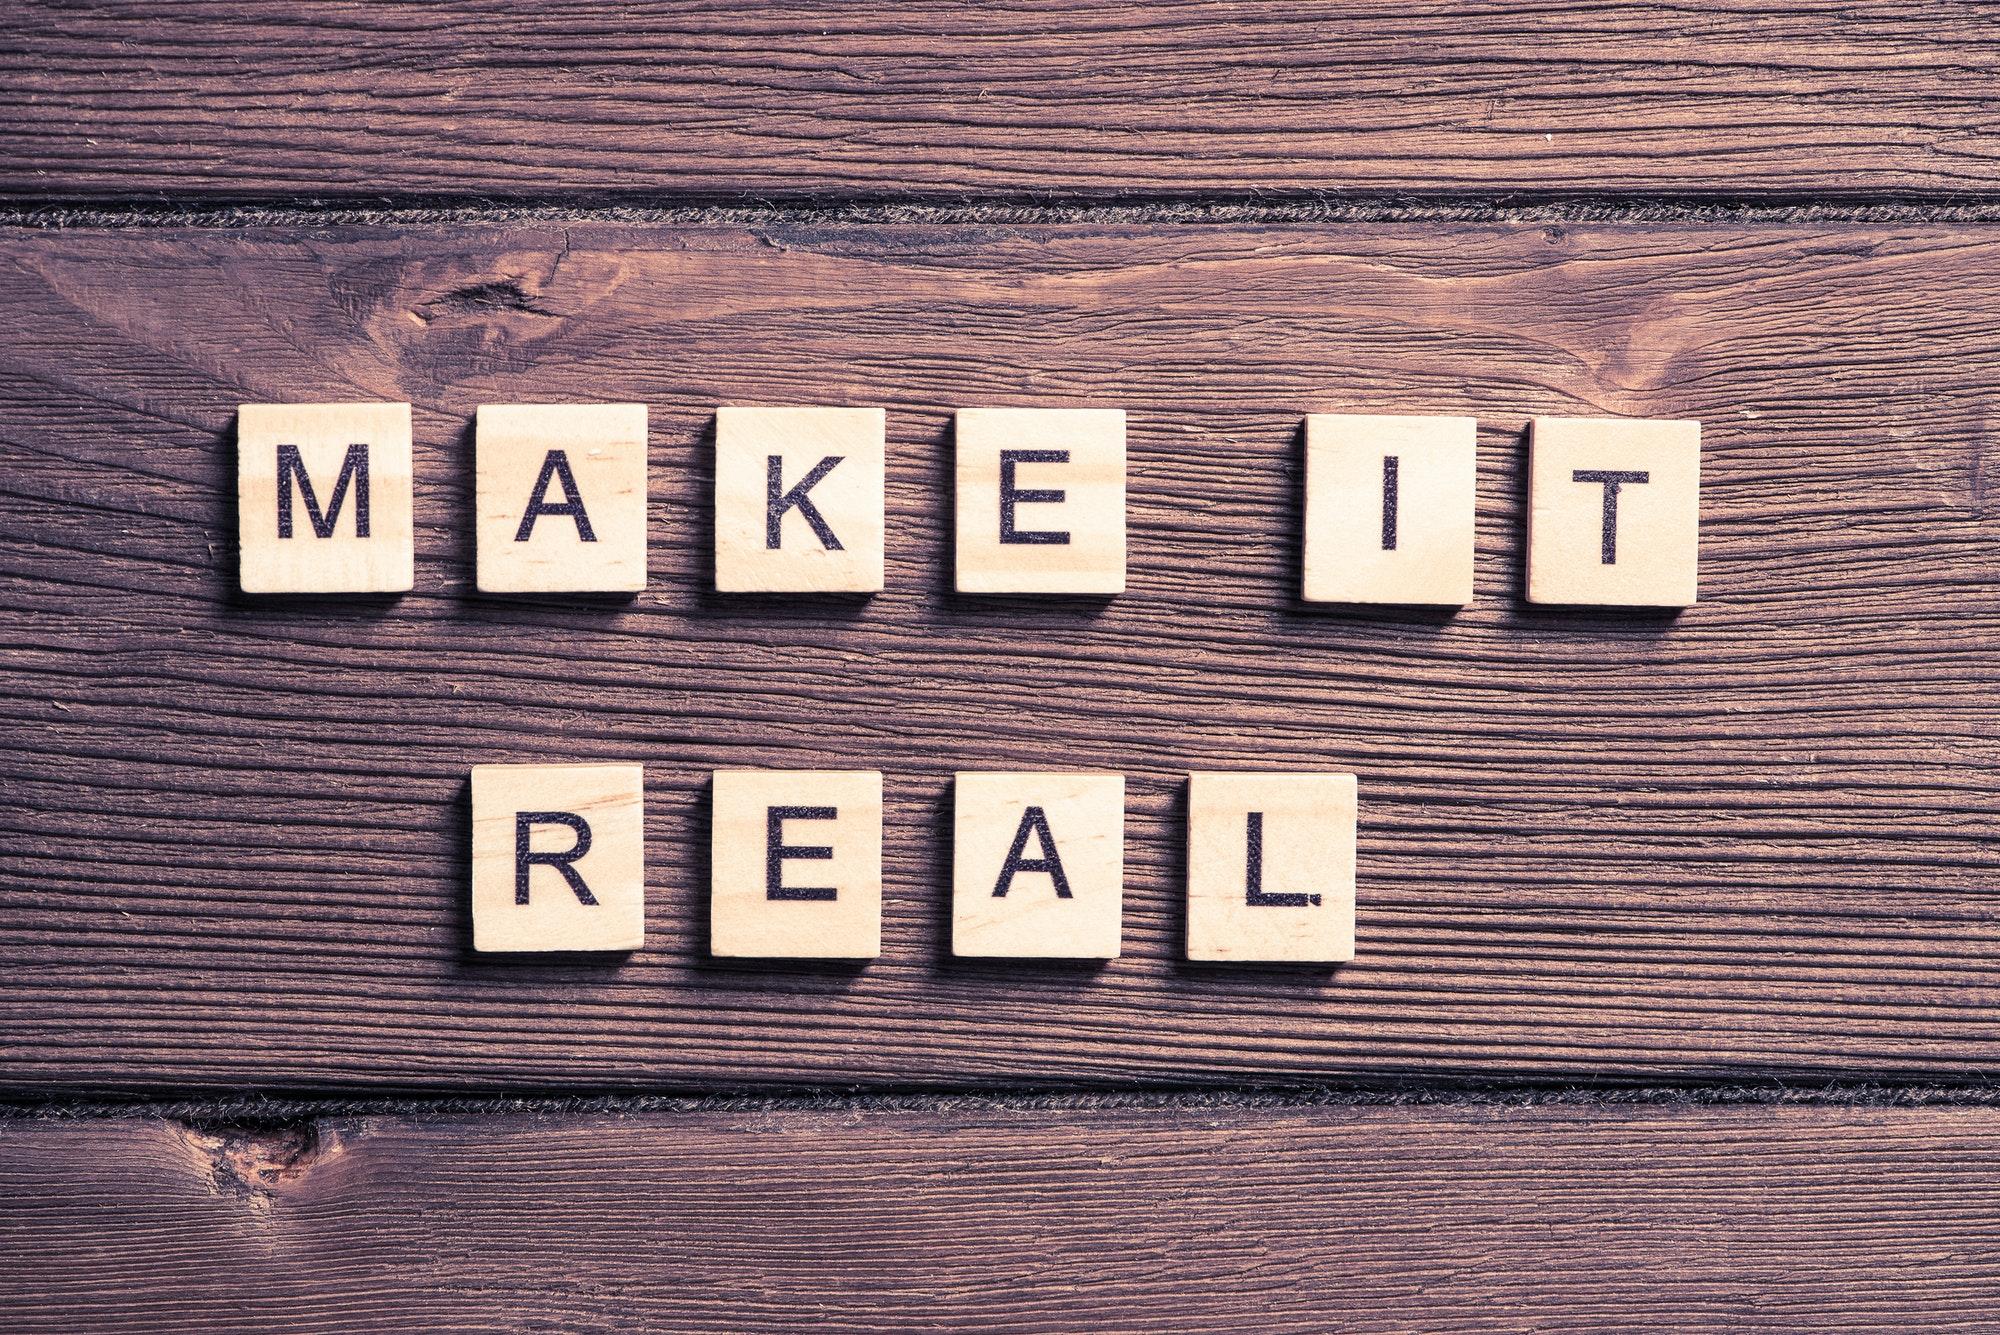 Make it real motivation